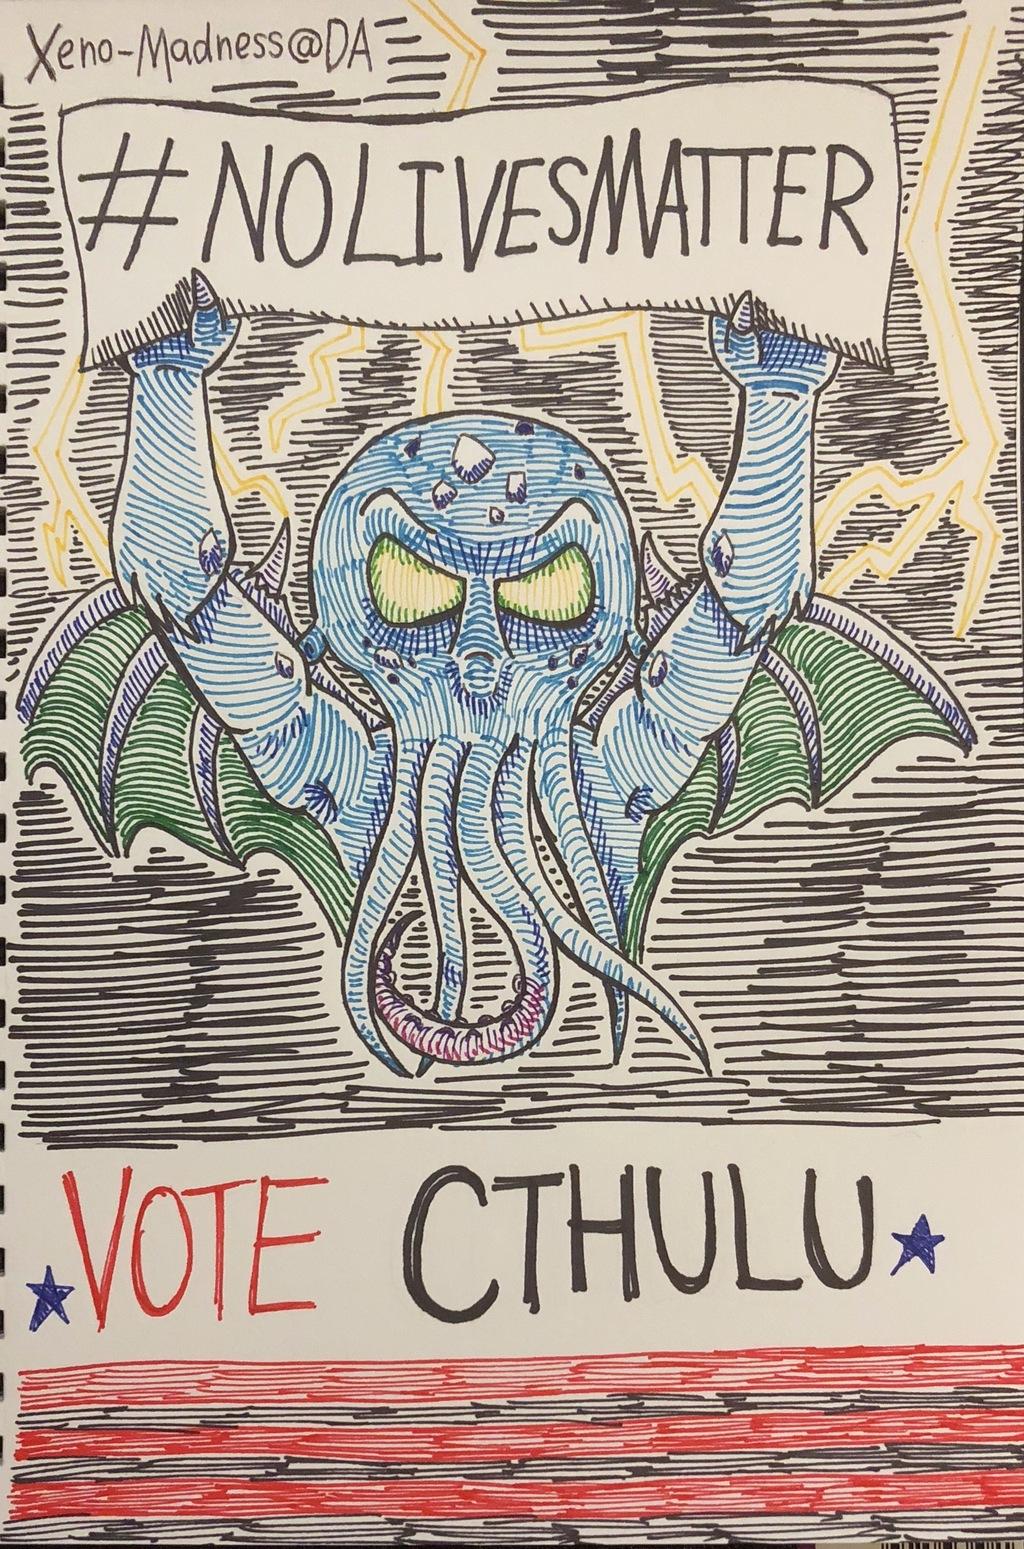 Inktober 8: Vote Cthulu